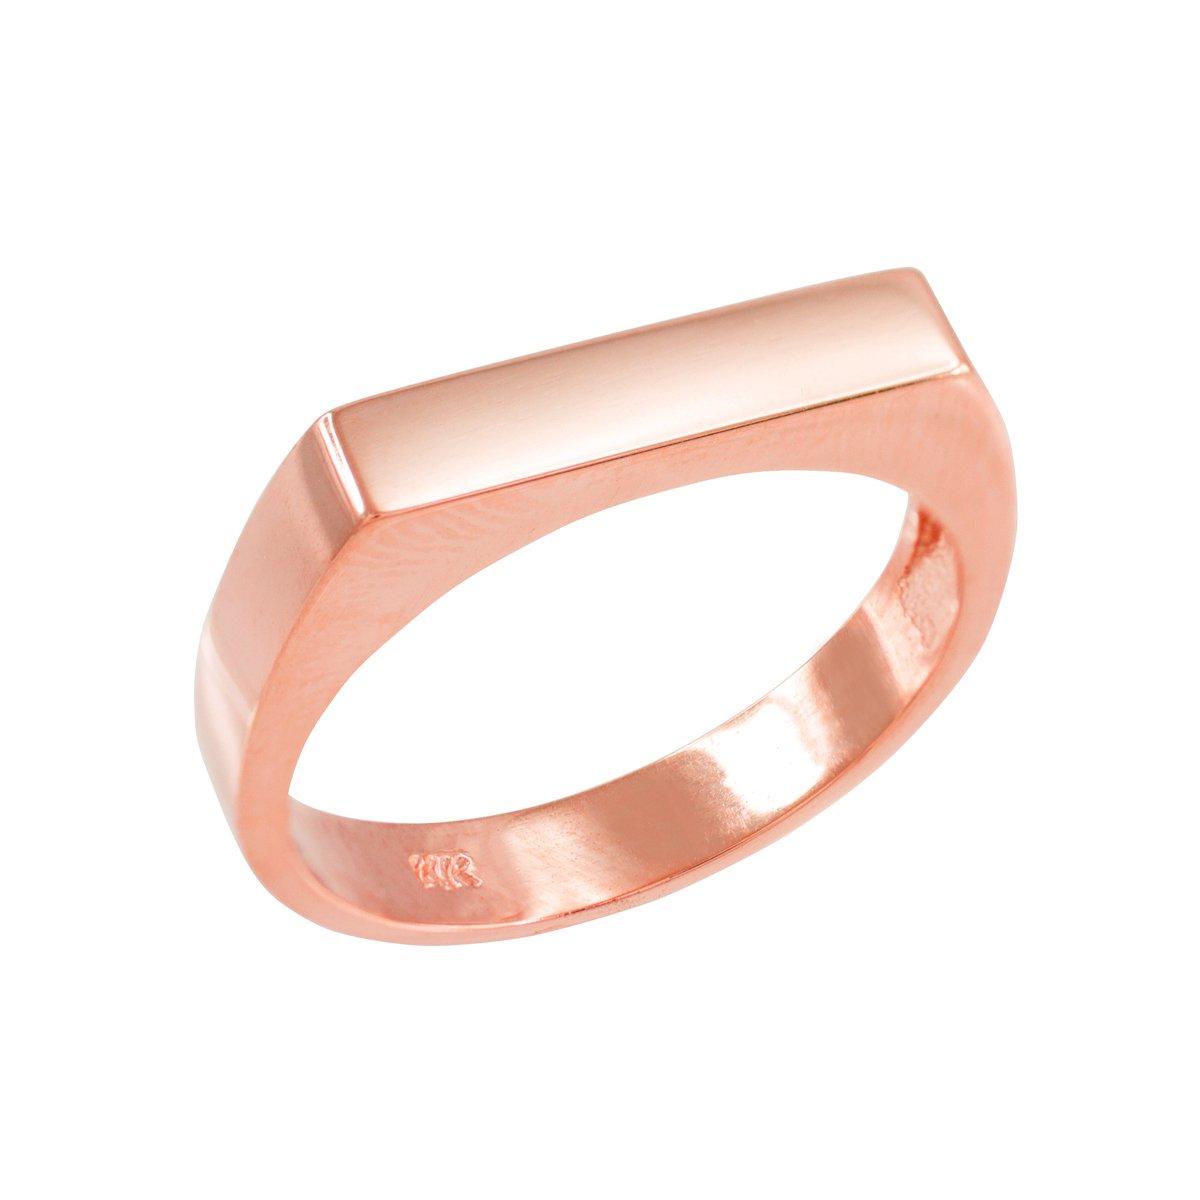 Stackable 10k Rose Gold Custom Engravable Flat Top Signet Ring (Size 7)